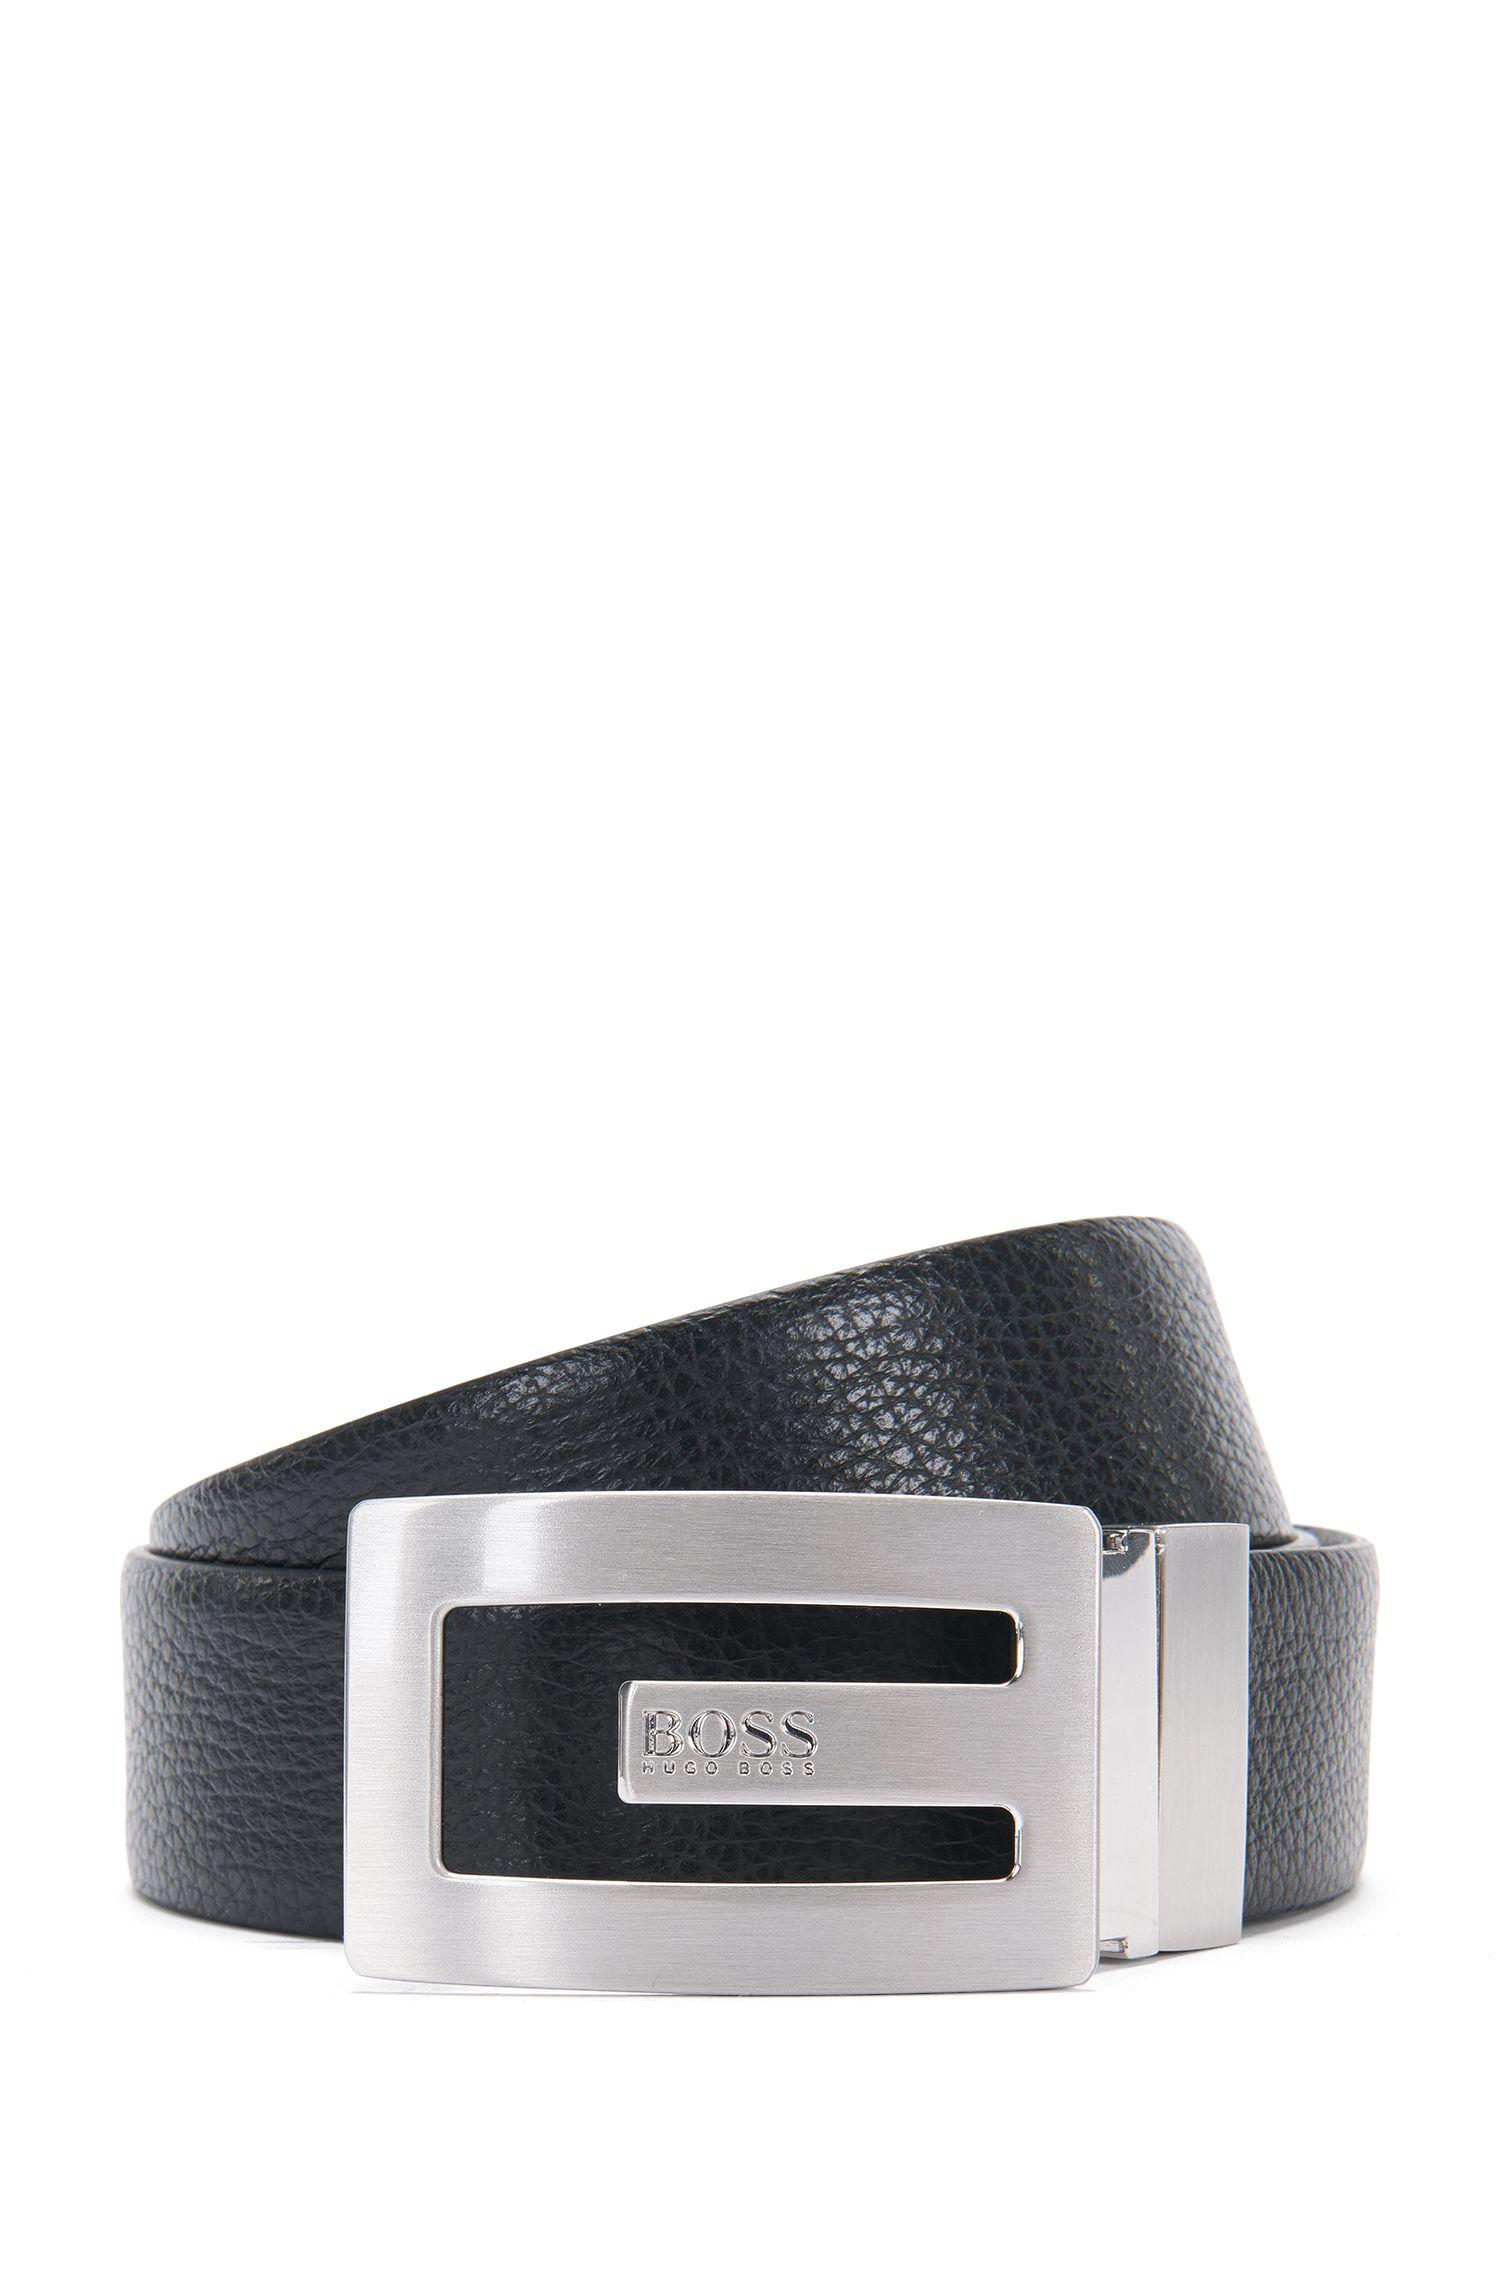 'Ranny Sr35 Itgr' | Reversible Grained Leather Belt